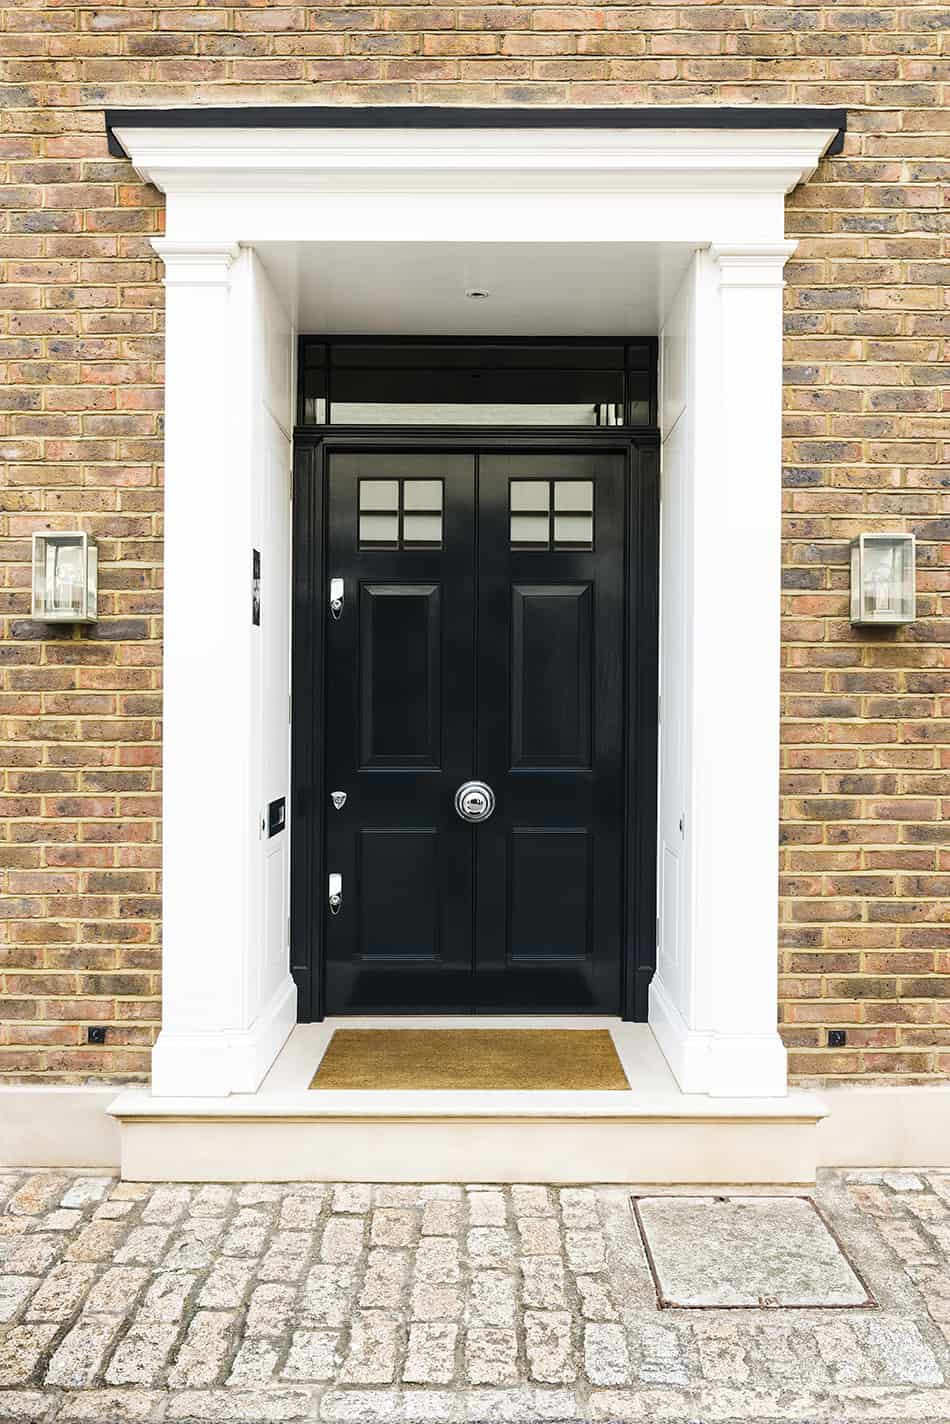 Glass front door with glass upper panels